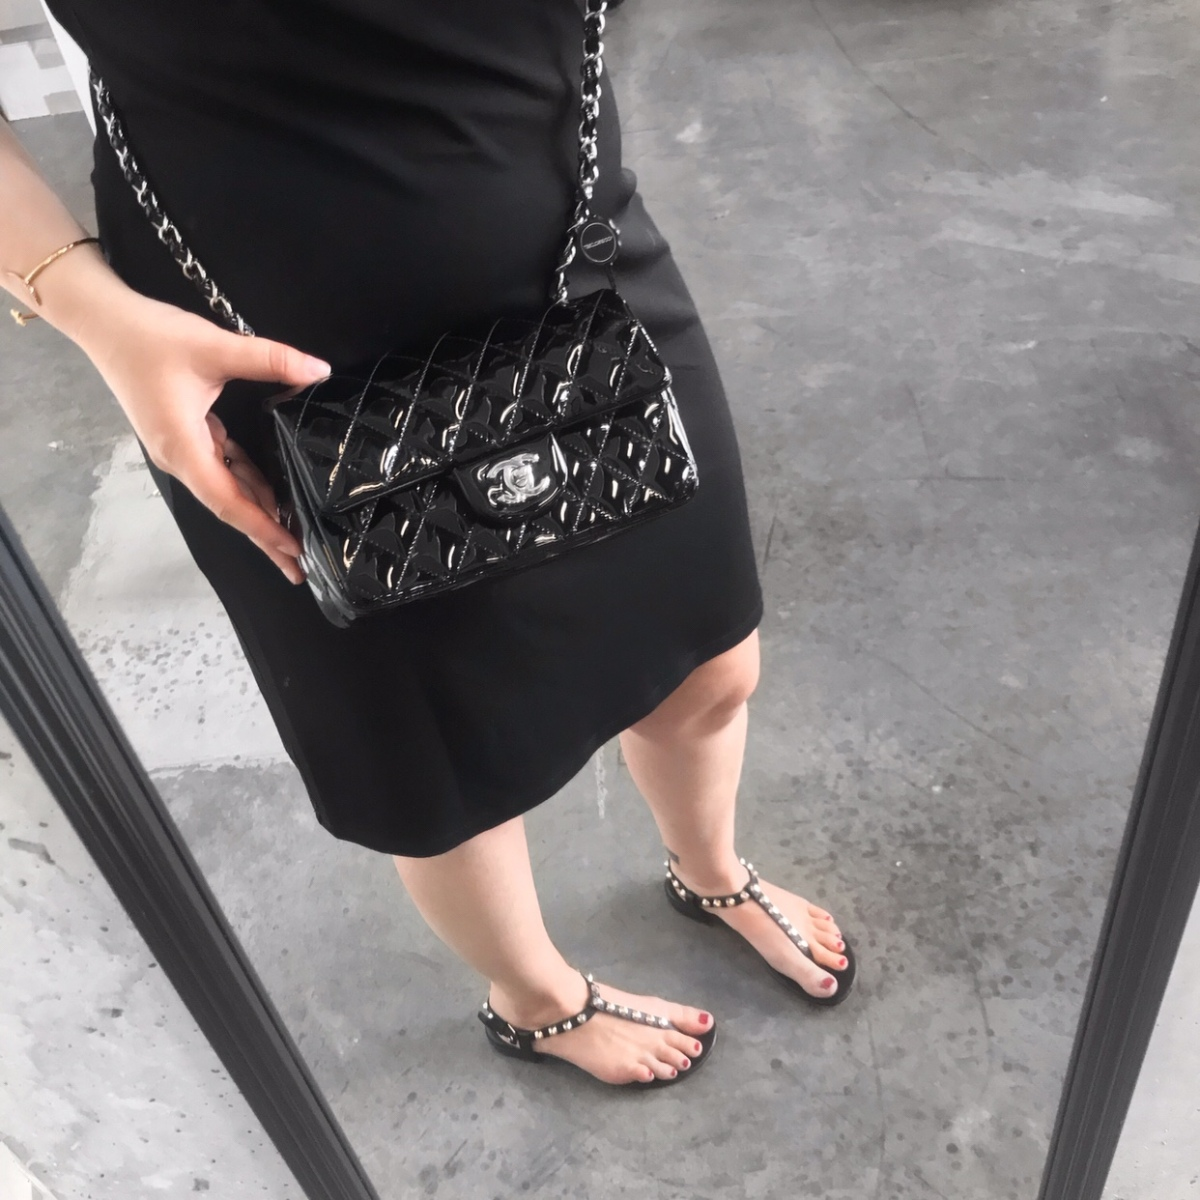 ad8459b9e11a Wishlist & Try On: Chanel New Mini Classic Flap Bag – Coffee and Handbags